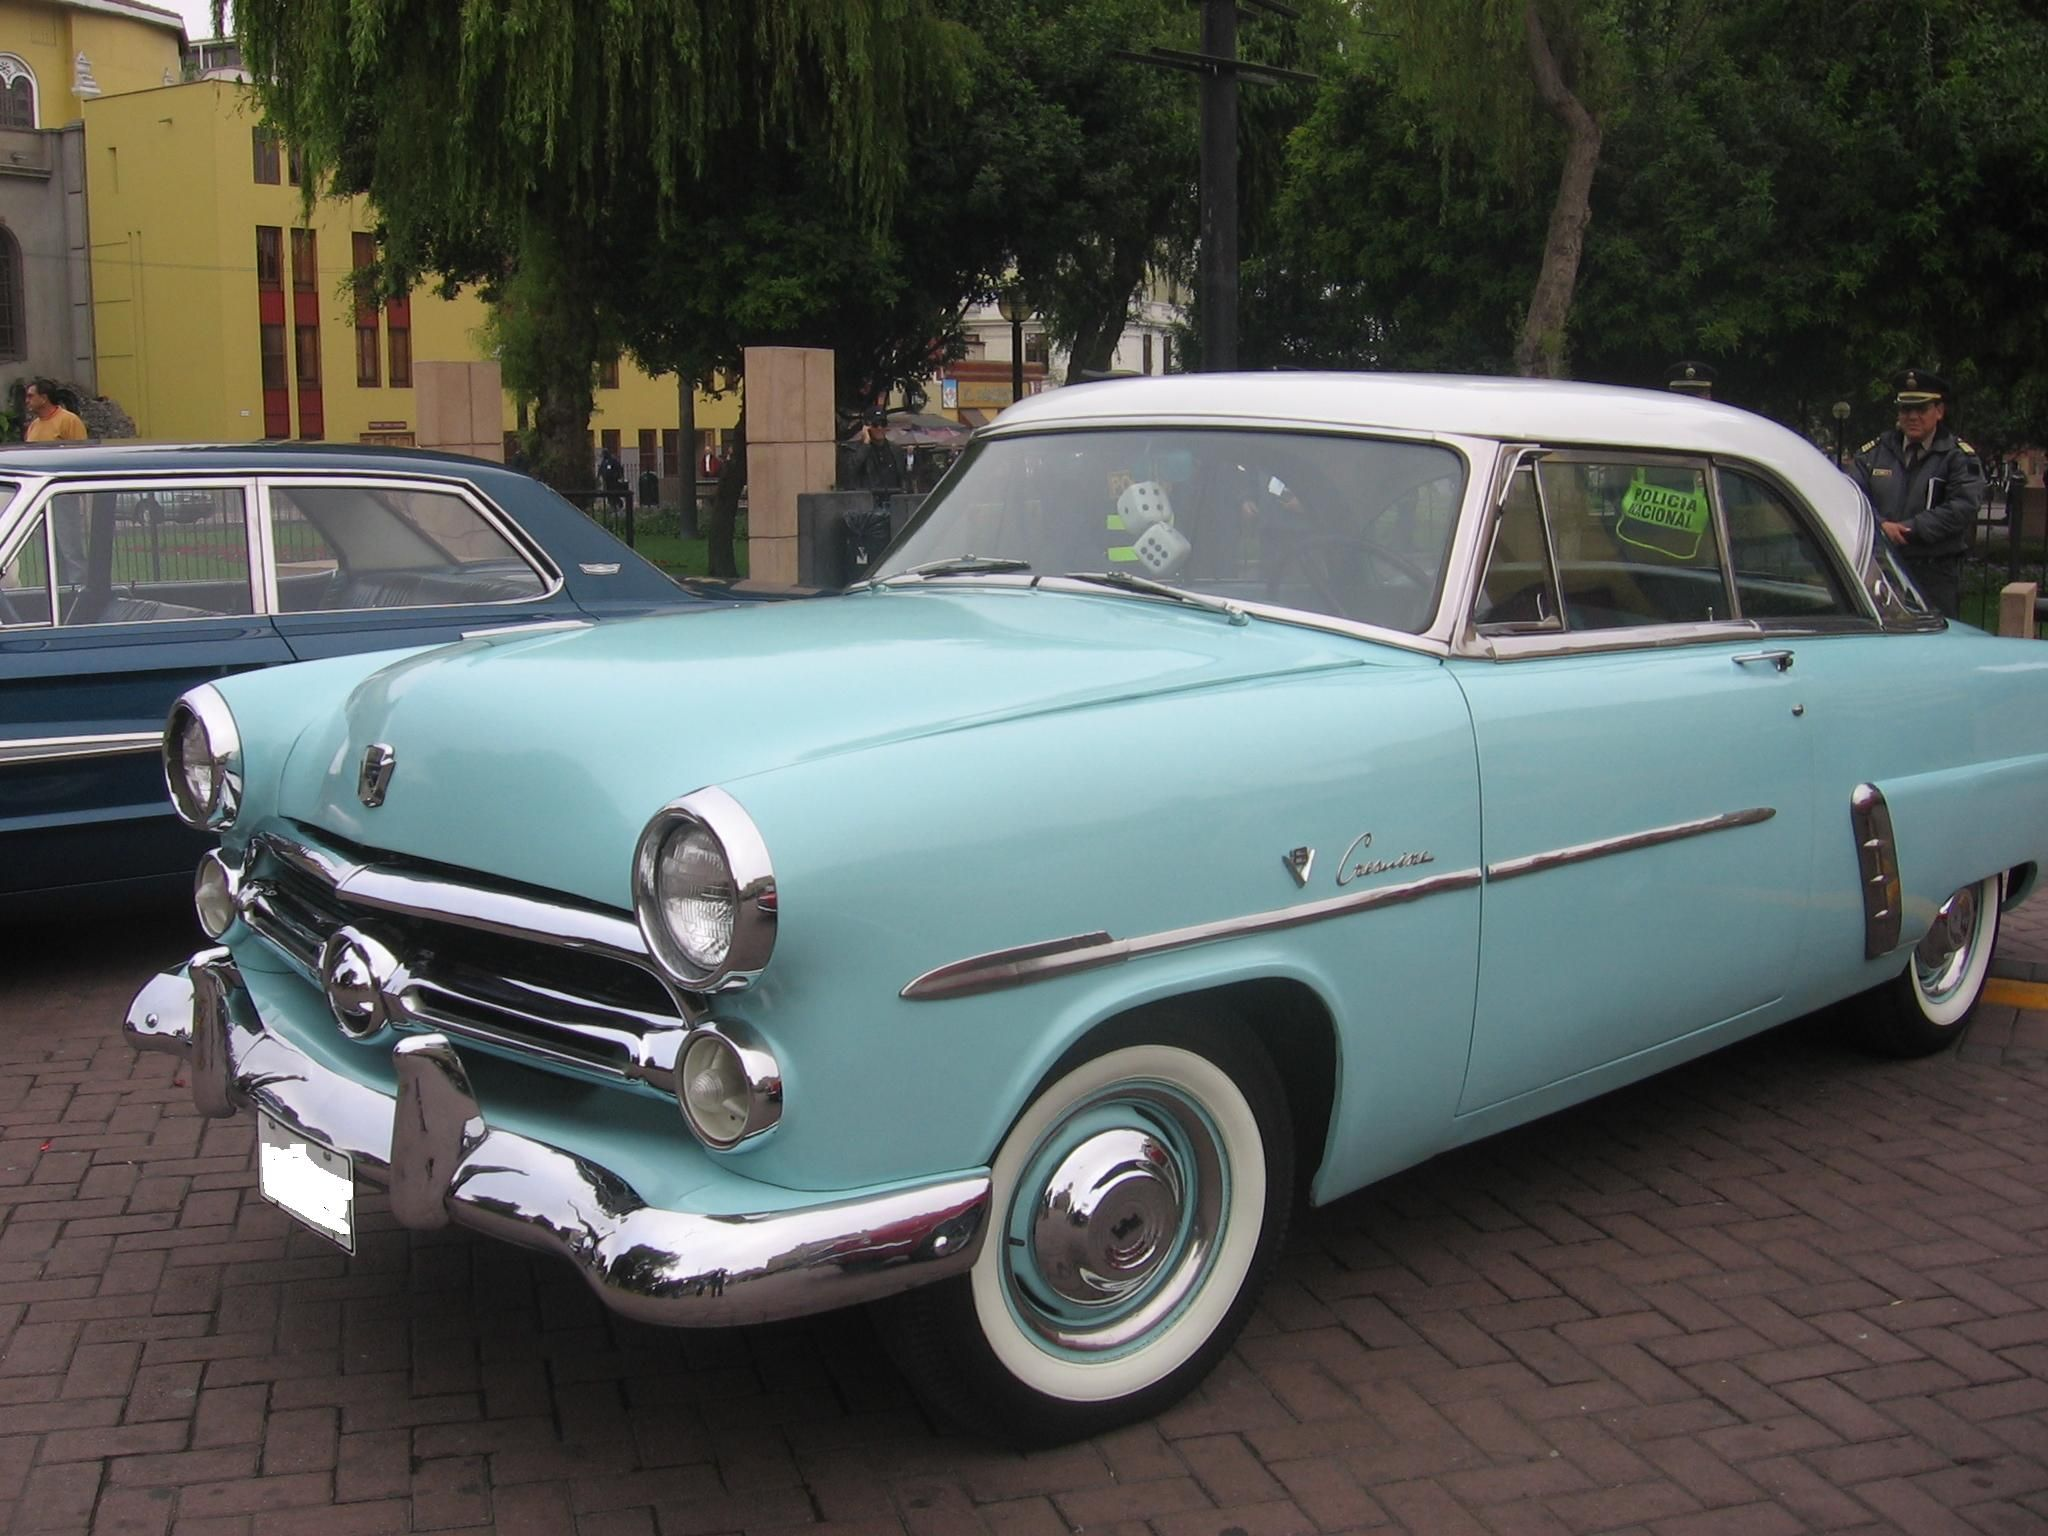 1956 ford customline wagon old car hunt - 1952 Ford Vehiclespolice Vehiclesantique